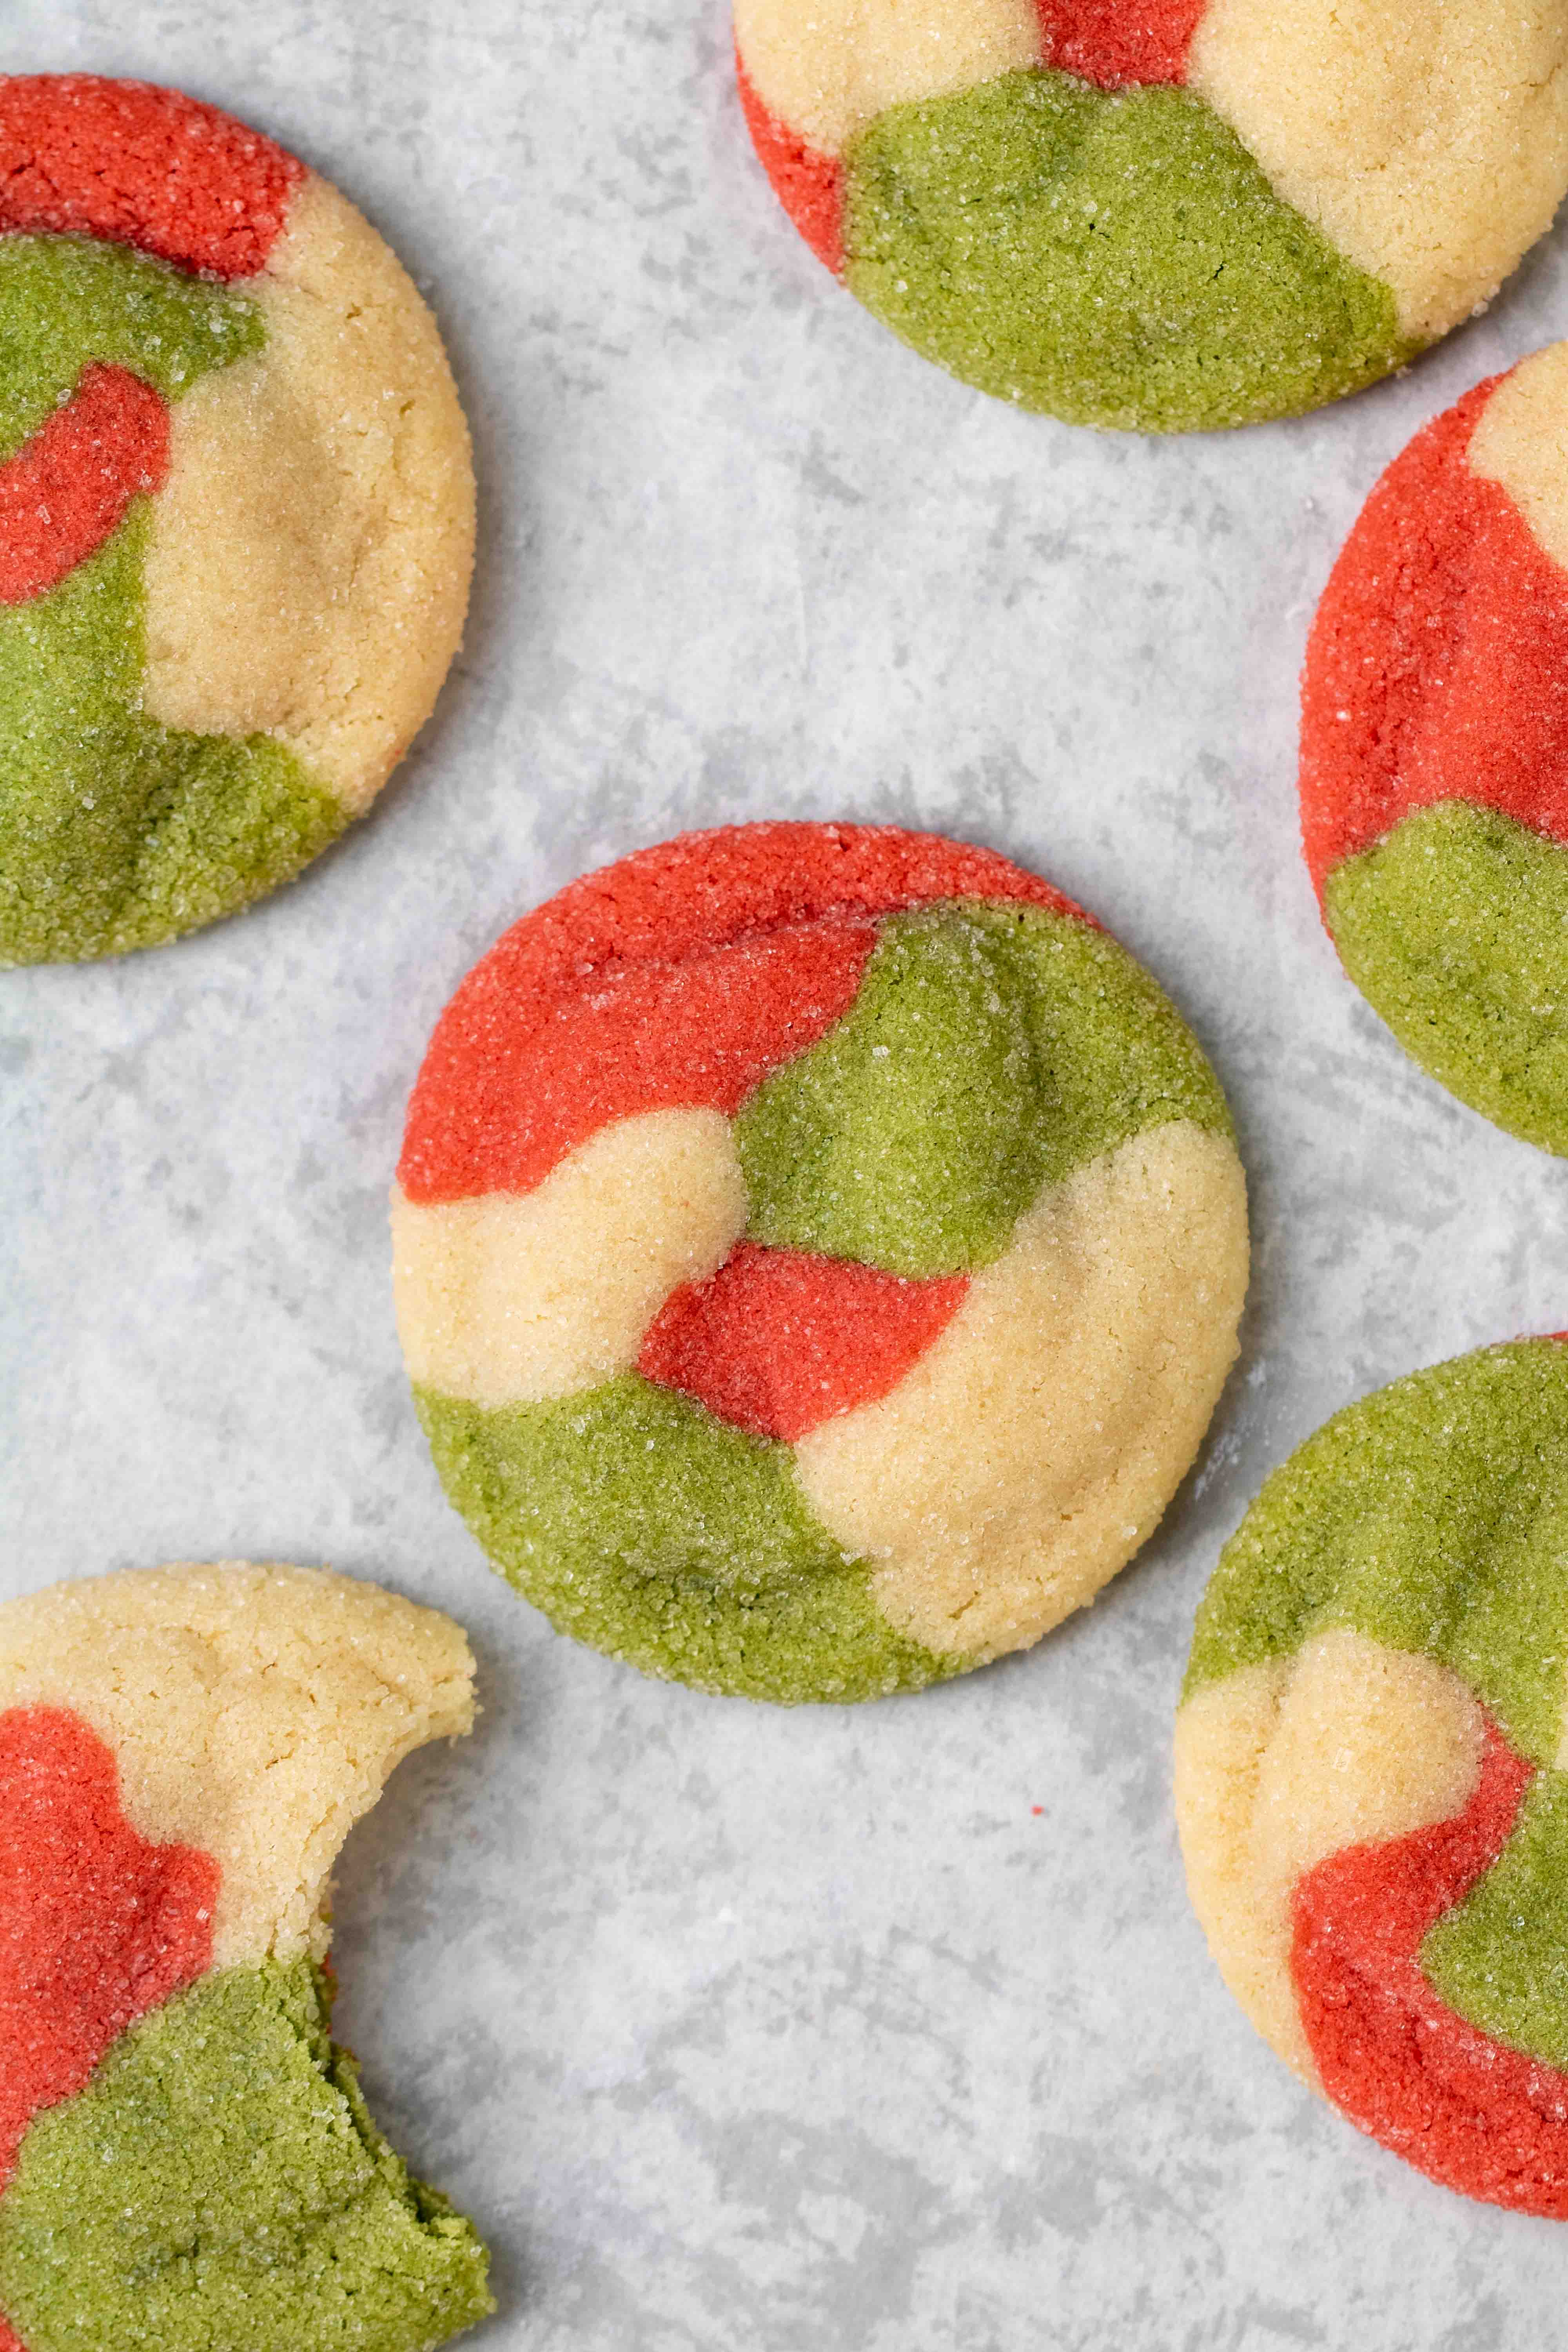 Marbled Christmas sugar cookie recipe